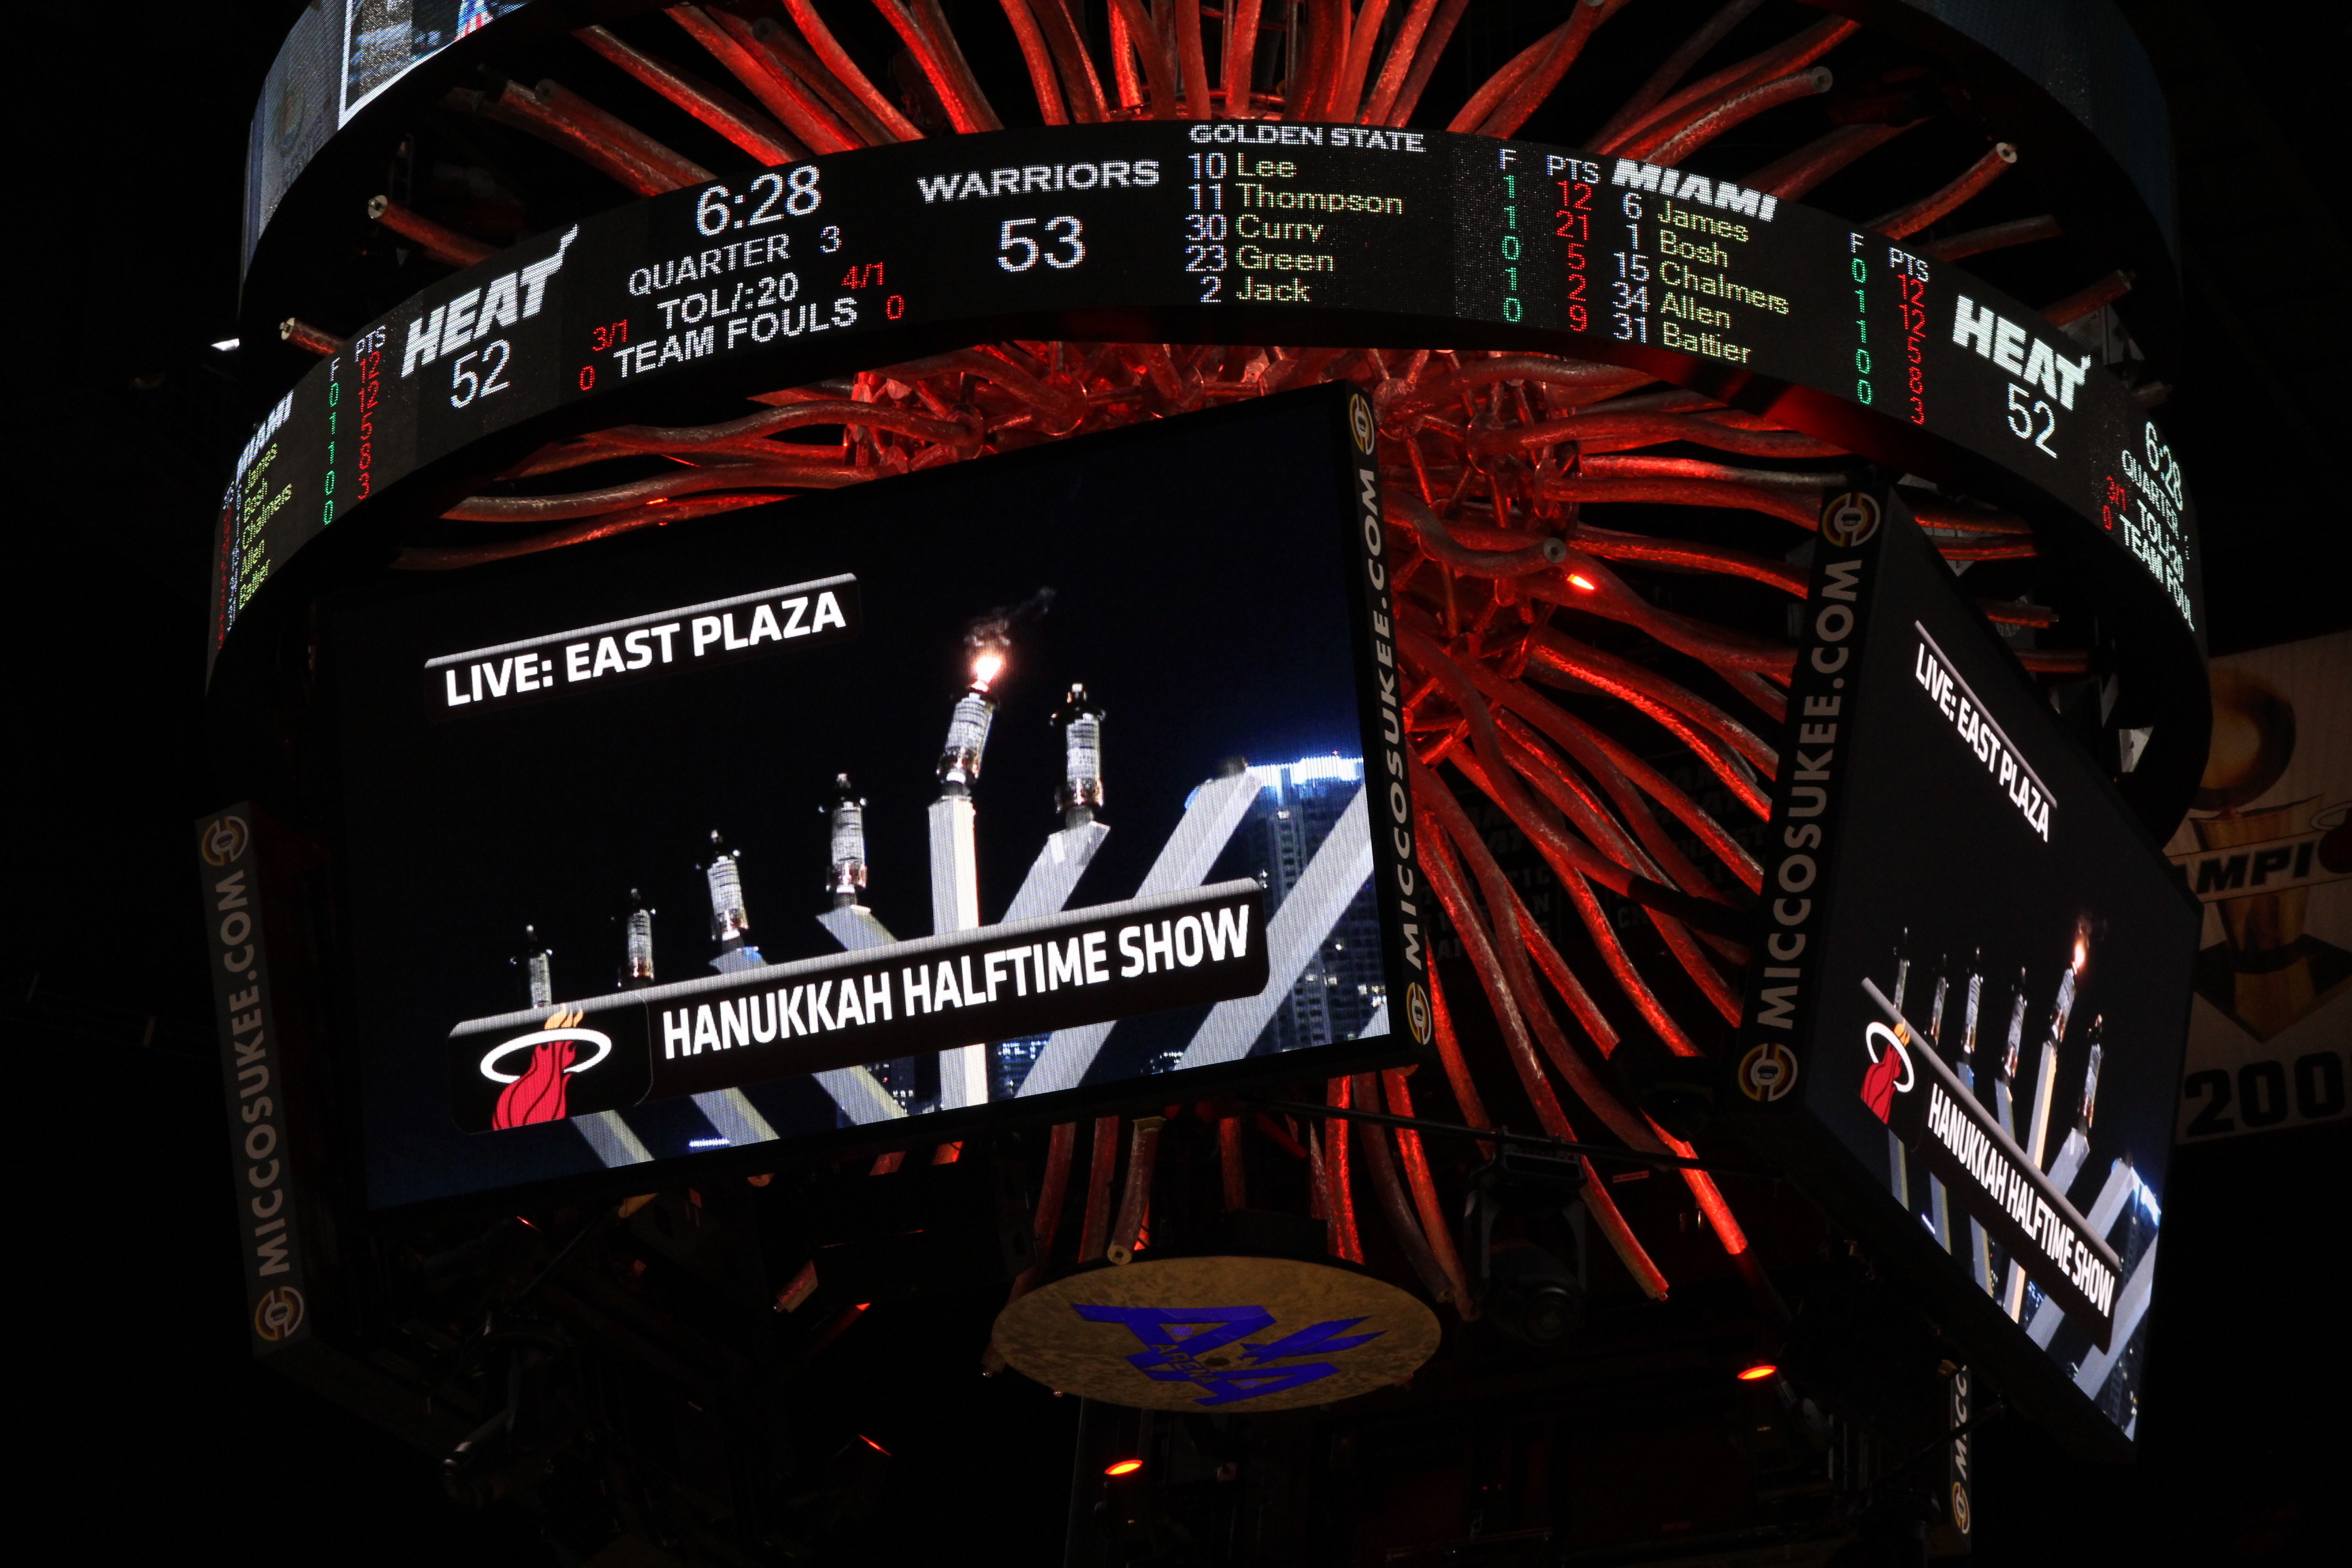 2012-12-14-4HalfTimeliveonJumbotron.jpg